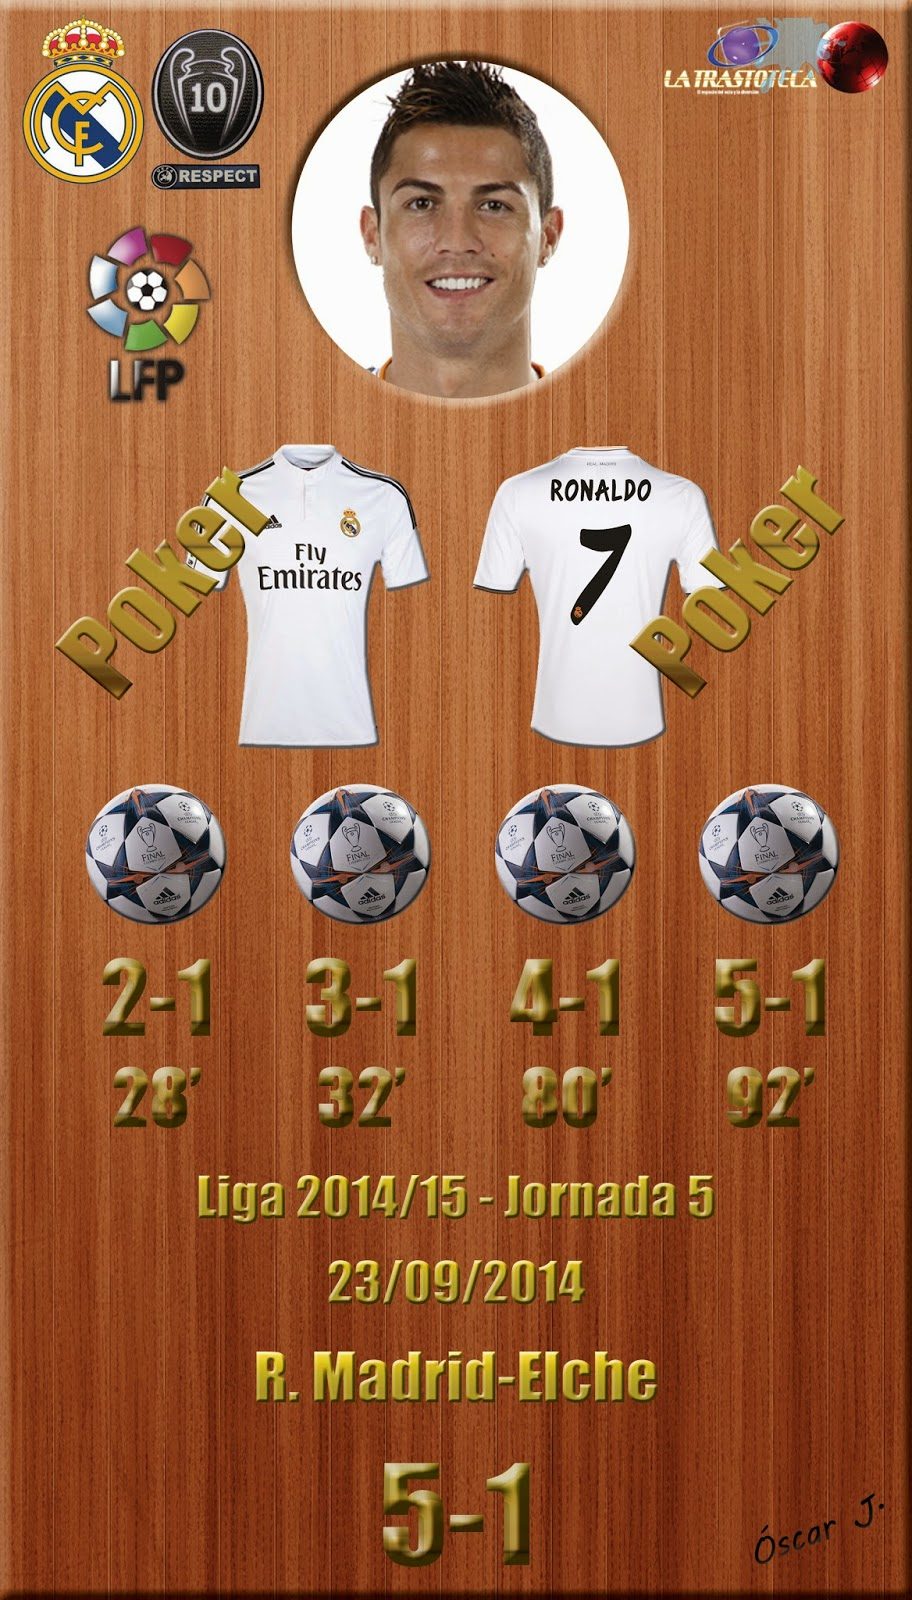 Cristiano Ronaldo, pasa del Hat-Trick y hace un Poker al Elche - Liga 2014/15. Jornada 5 (23/9/2014)